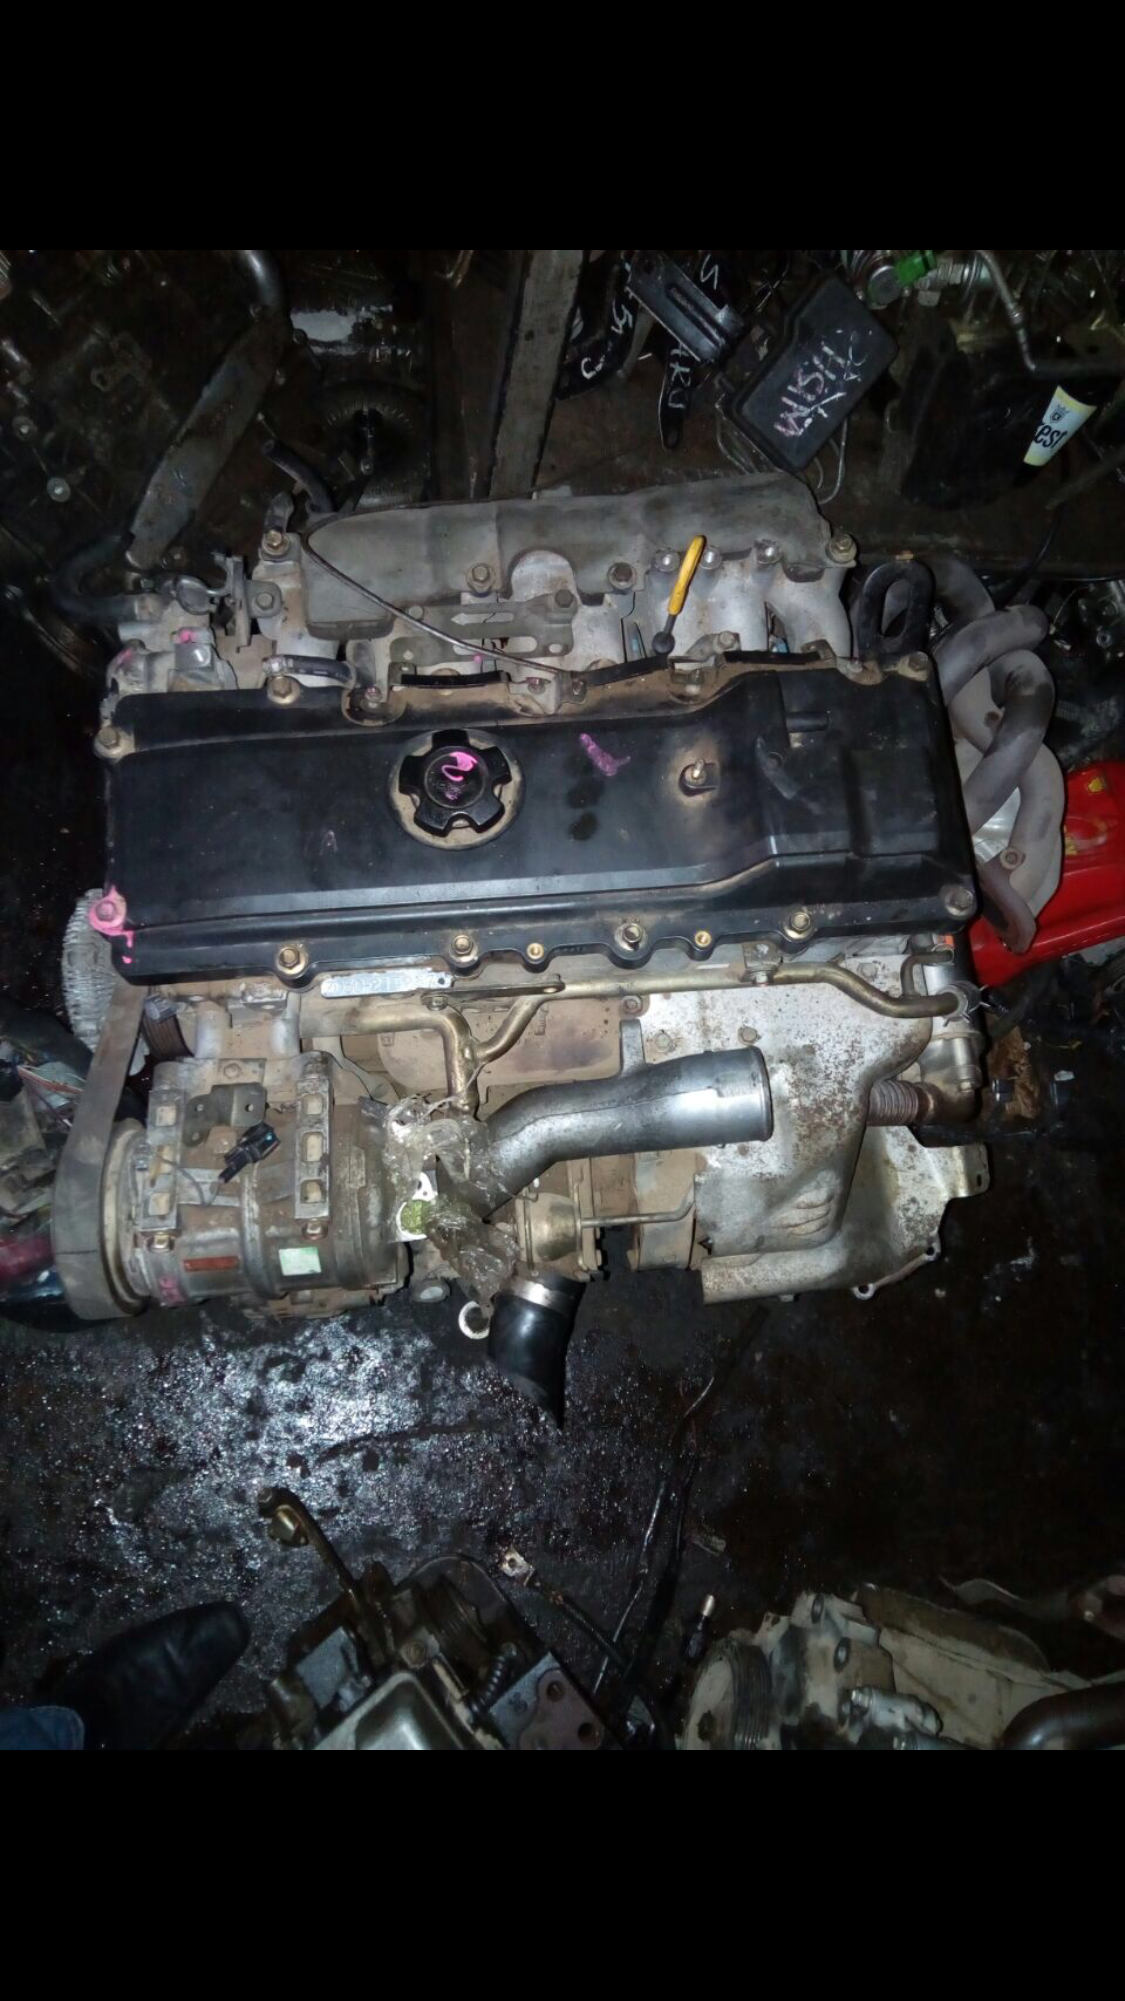 Zd30 engin 00666